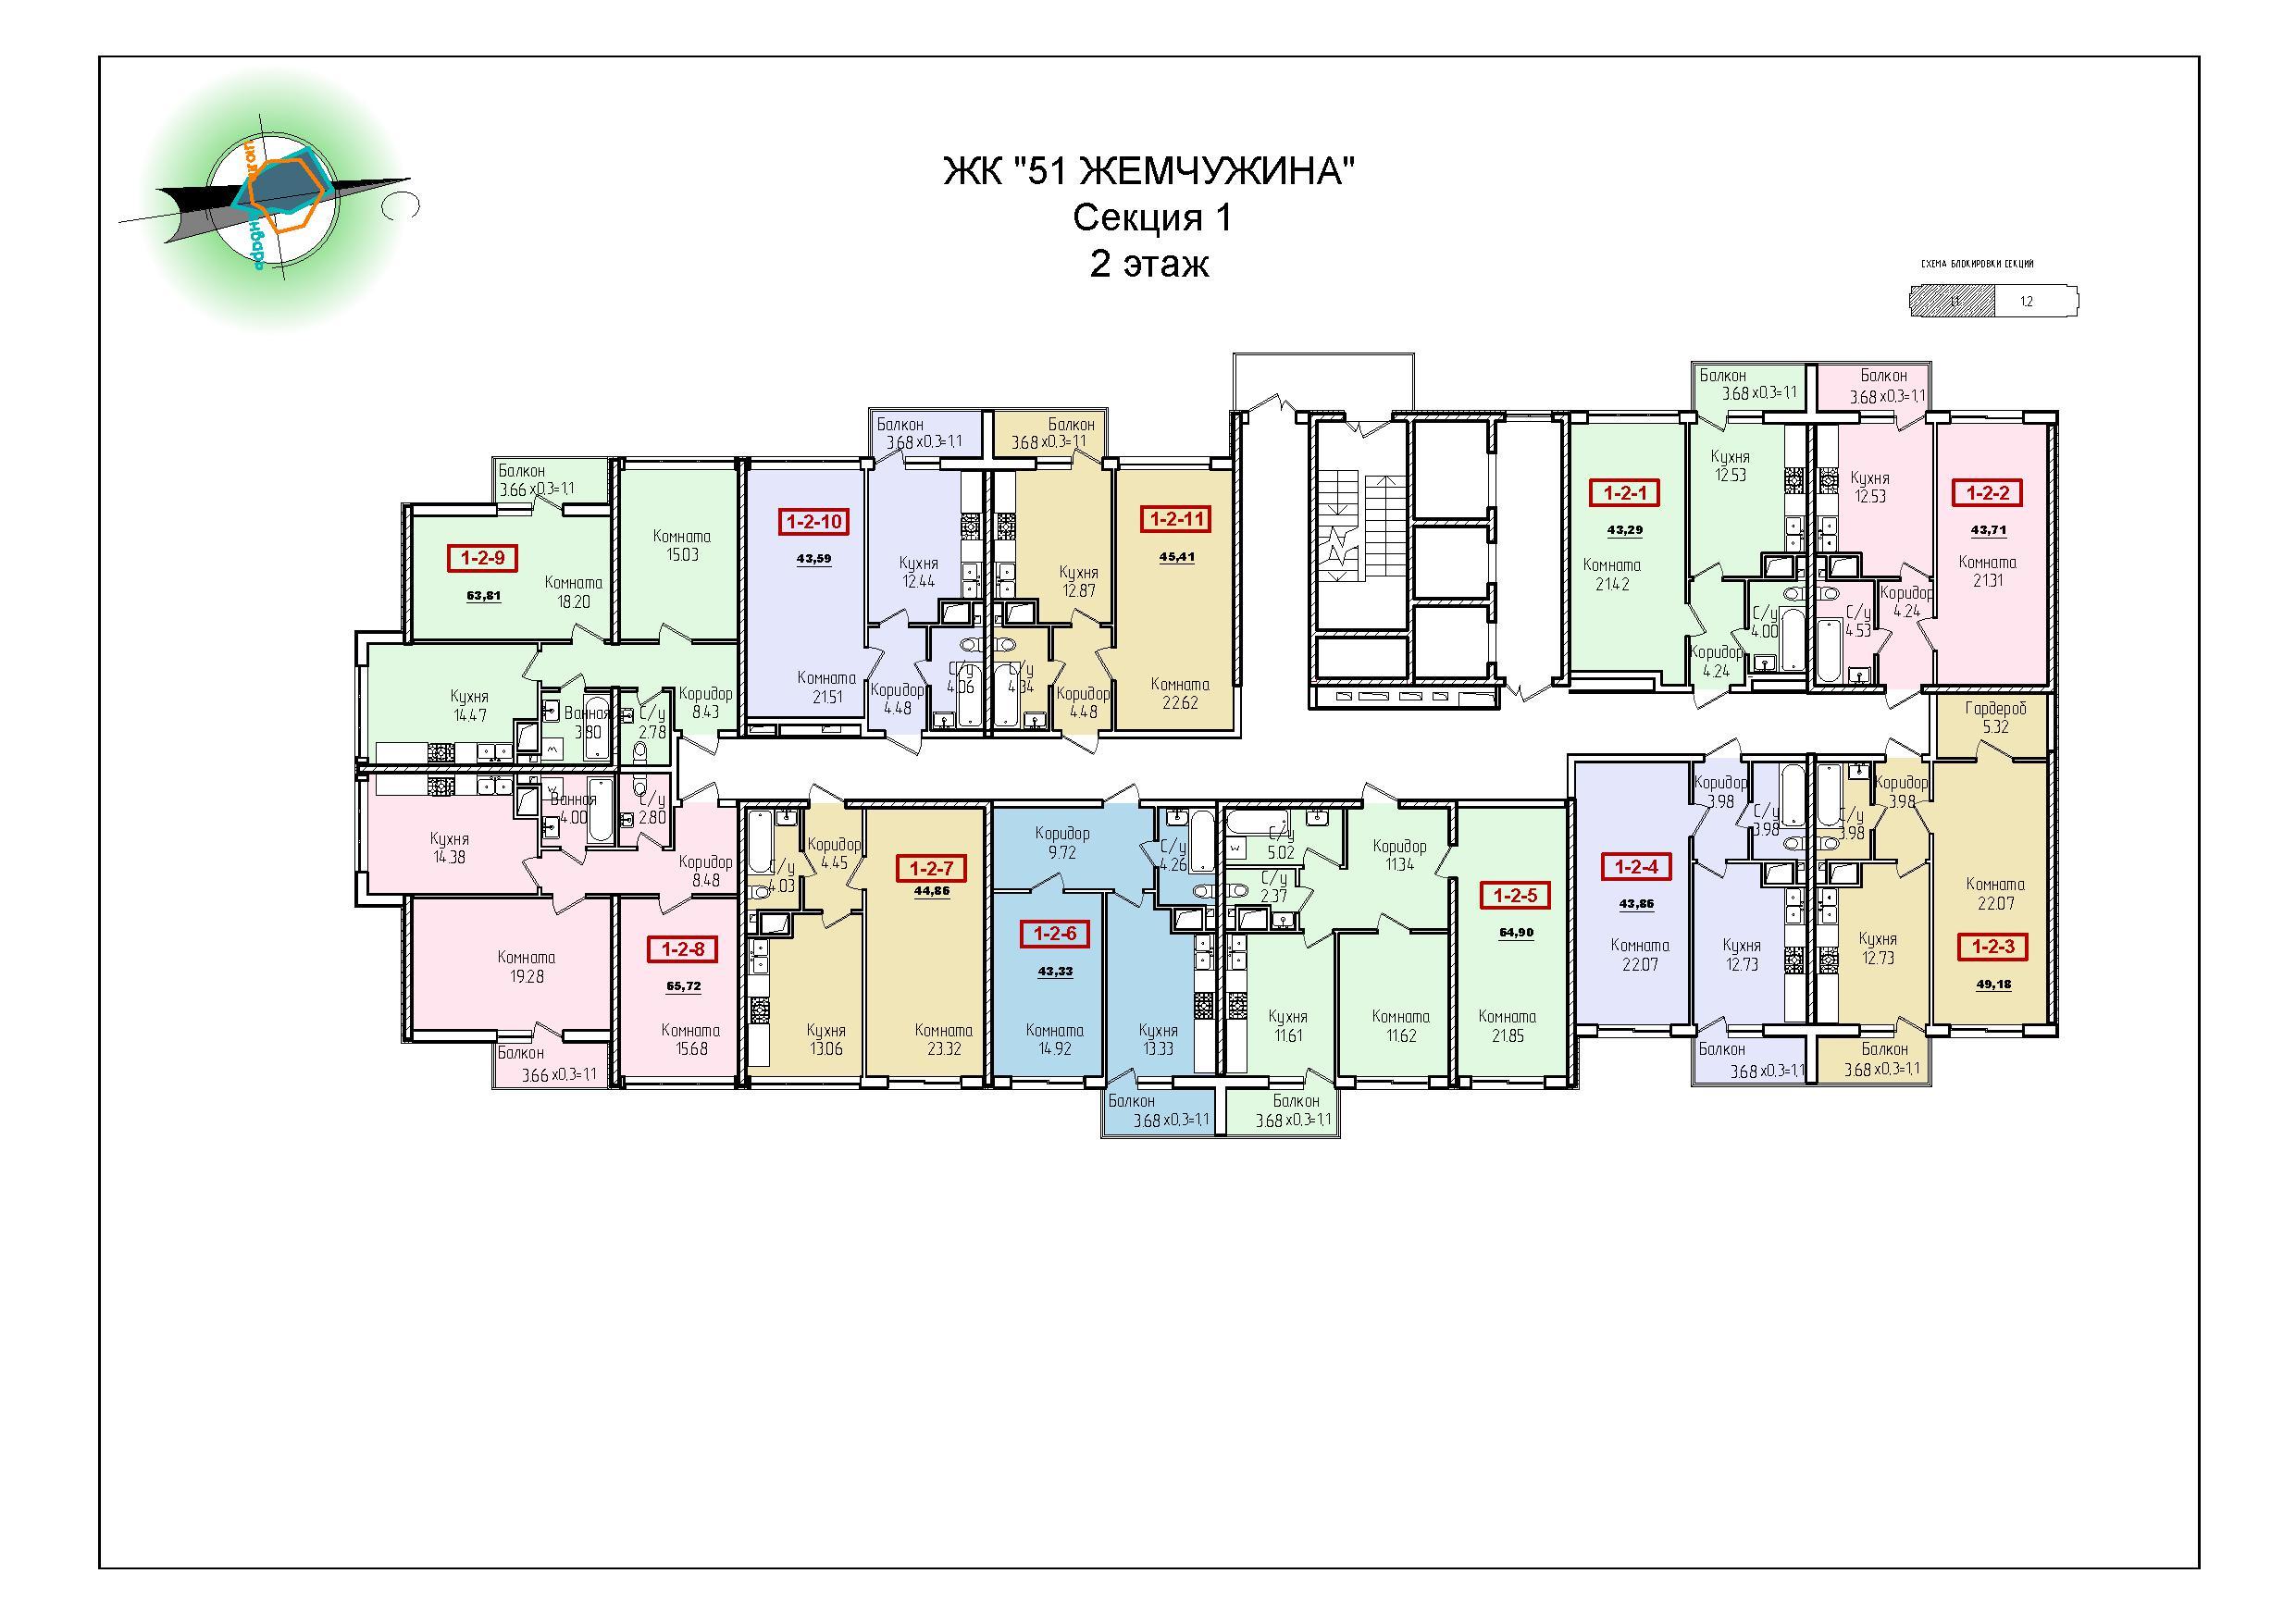 ЖК 51 Жемчужина 1 секция план 2 этажа